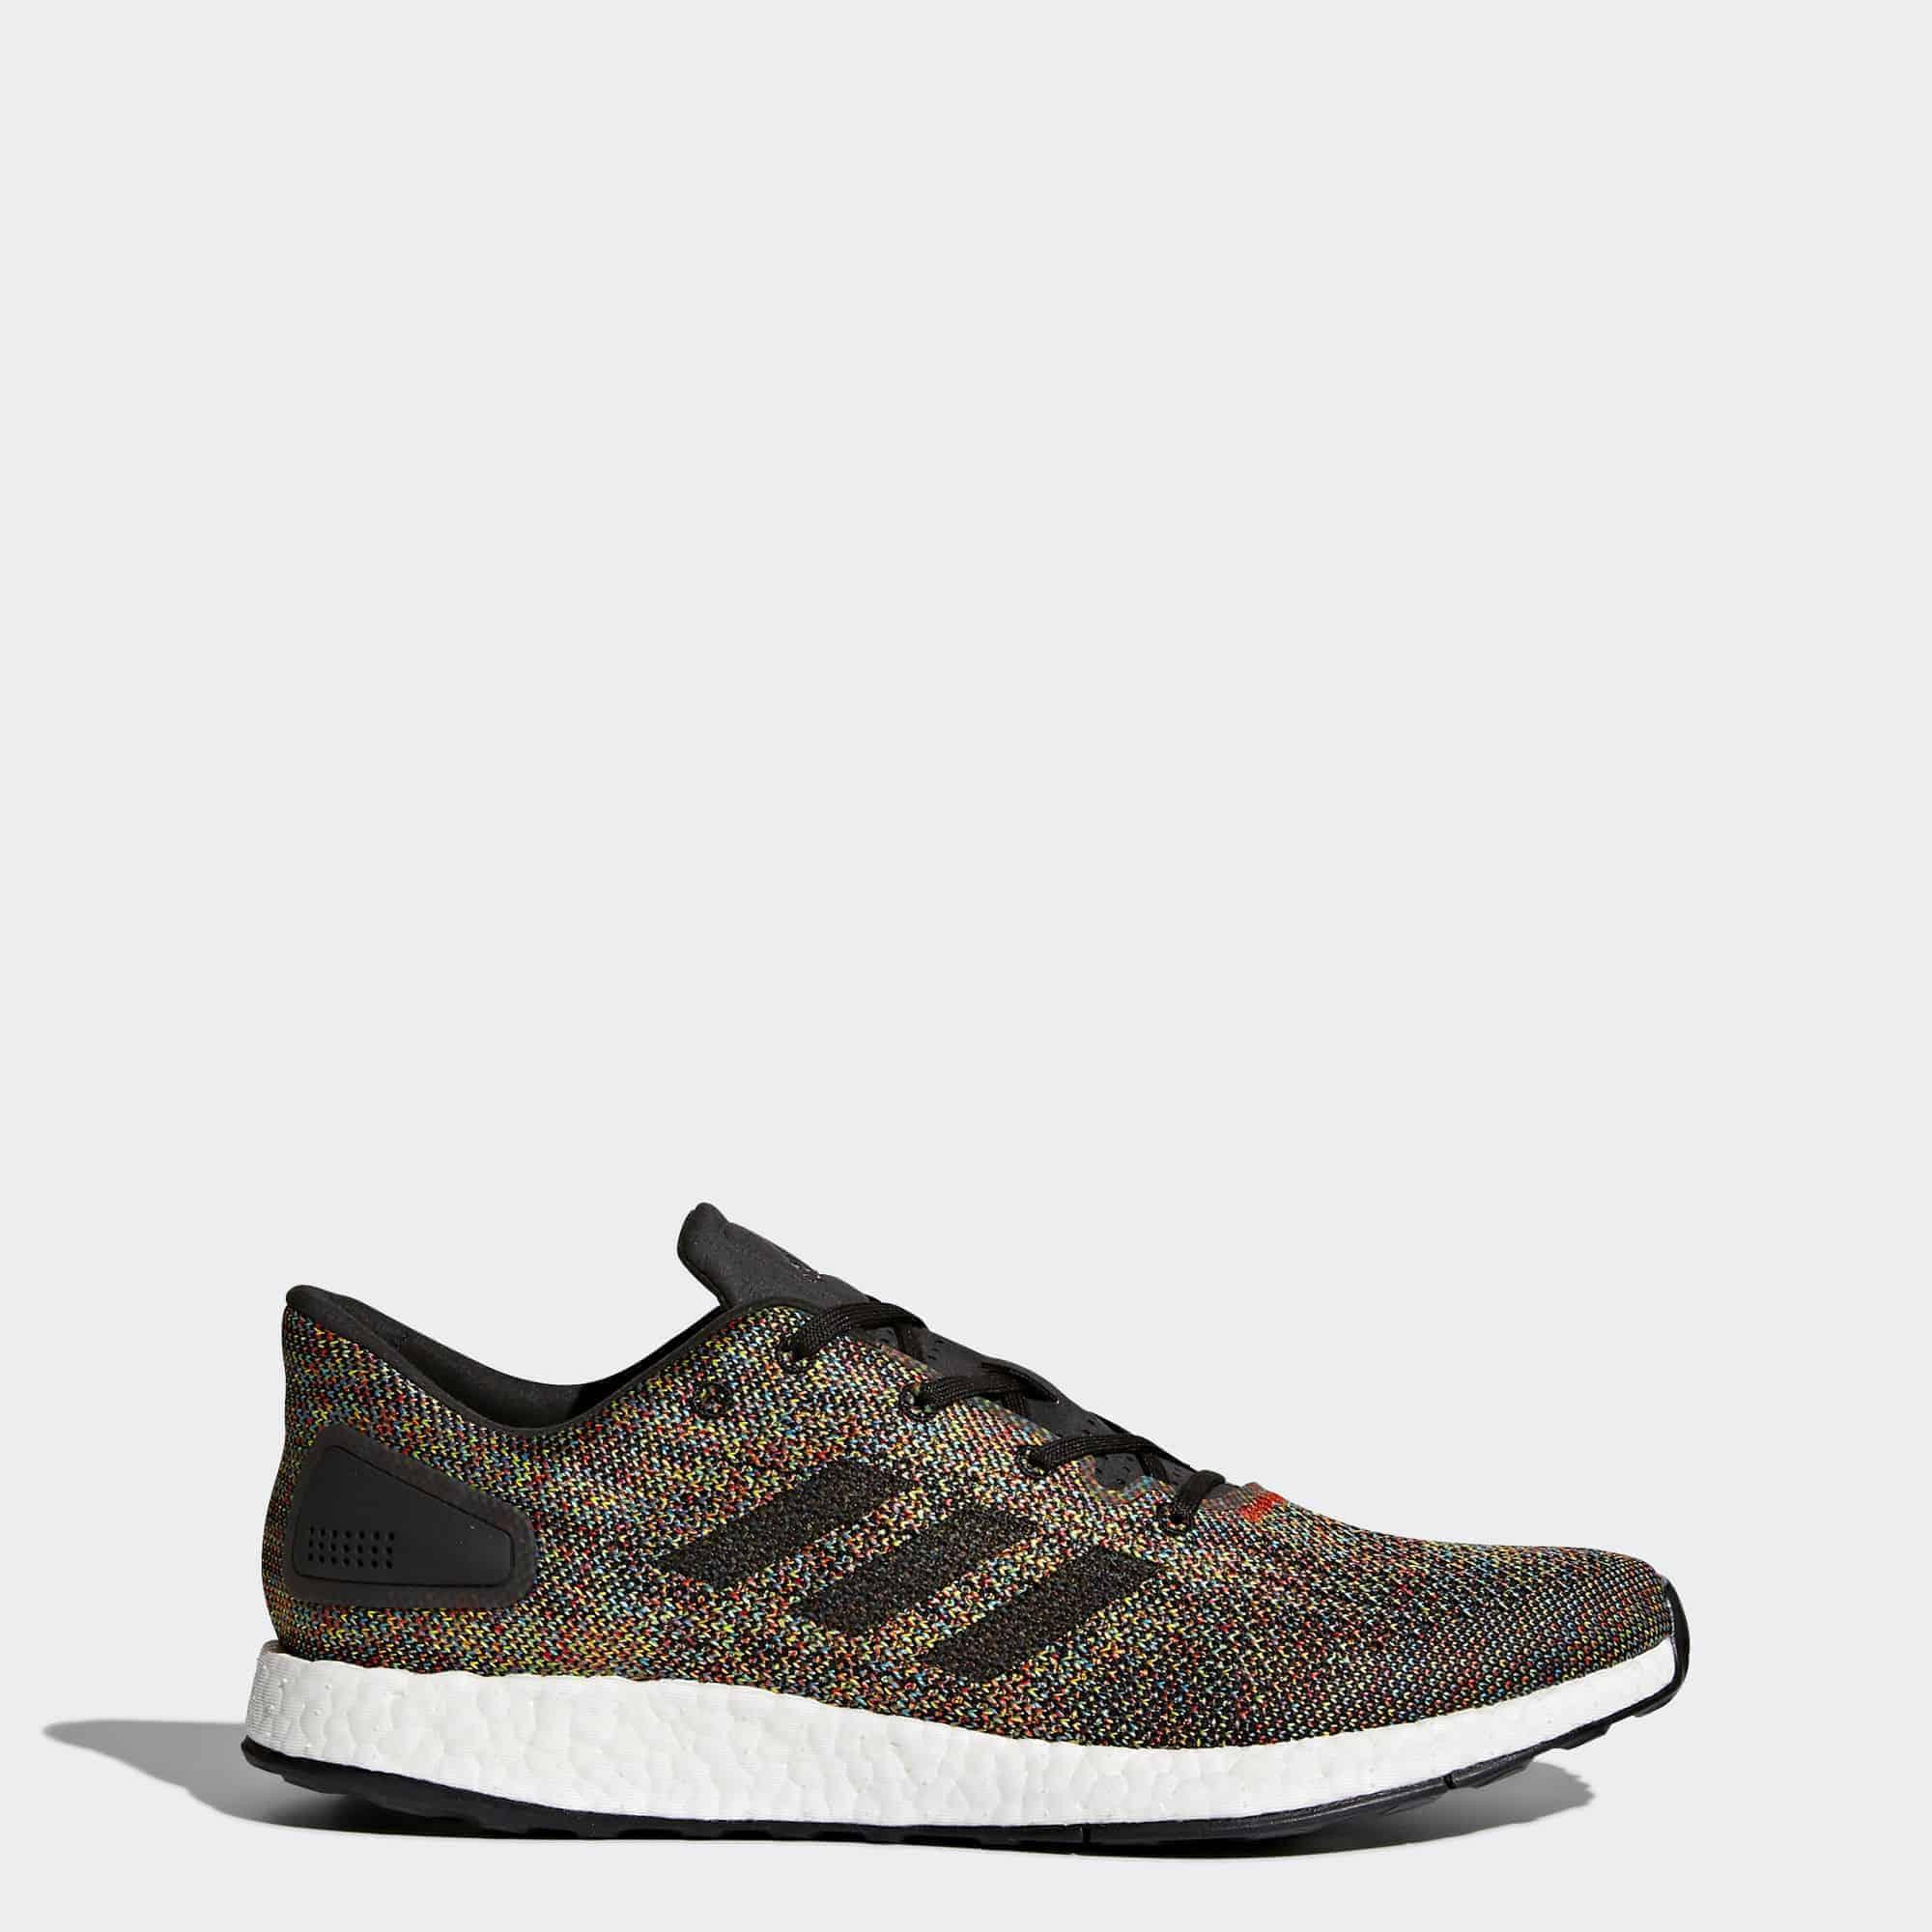 Кроссовки для бега Adidas Pure Boost DPR LTD мужские